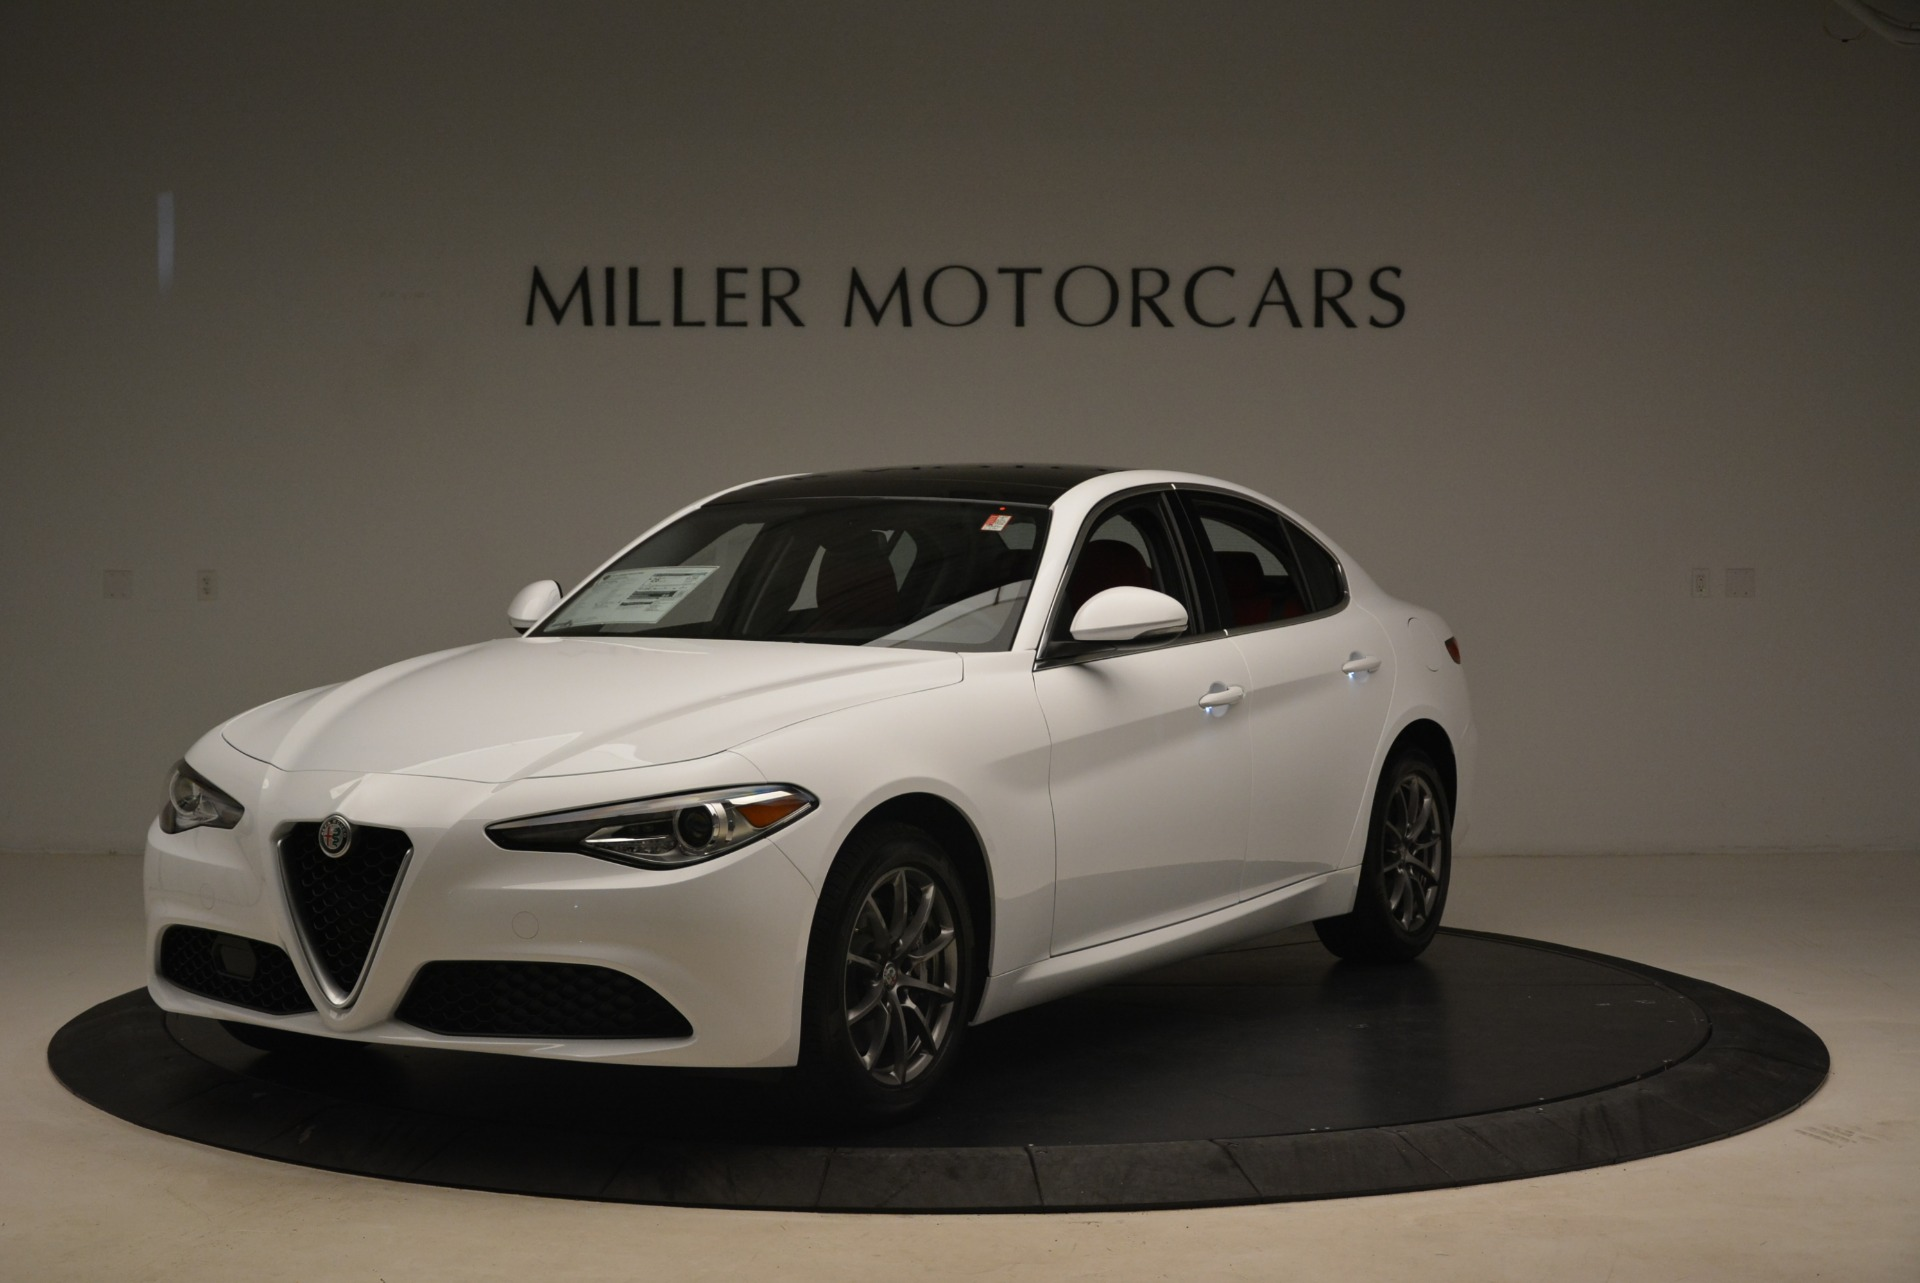 Alfa Romeo Lease Specials Miller Motorcars New Alfa Romeo